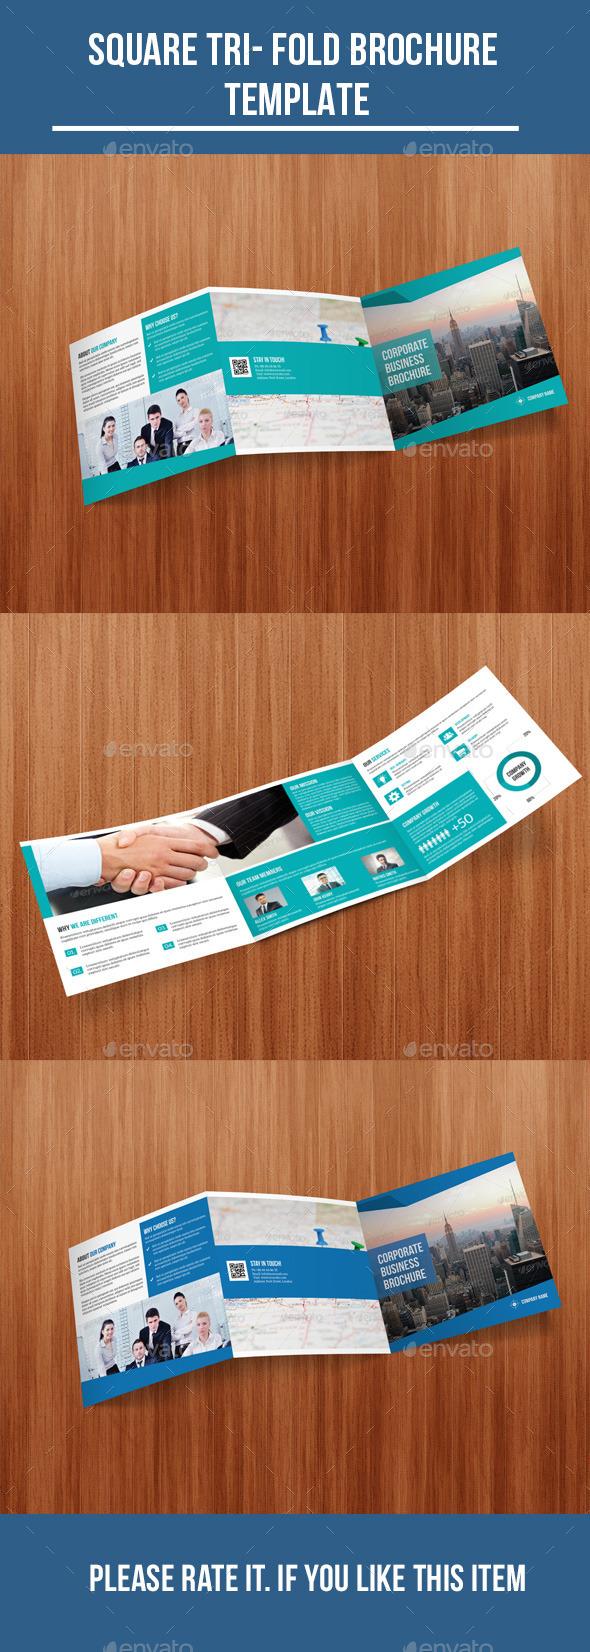 Square Tri- Fold Corporate Brochure - Corporate Brochures